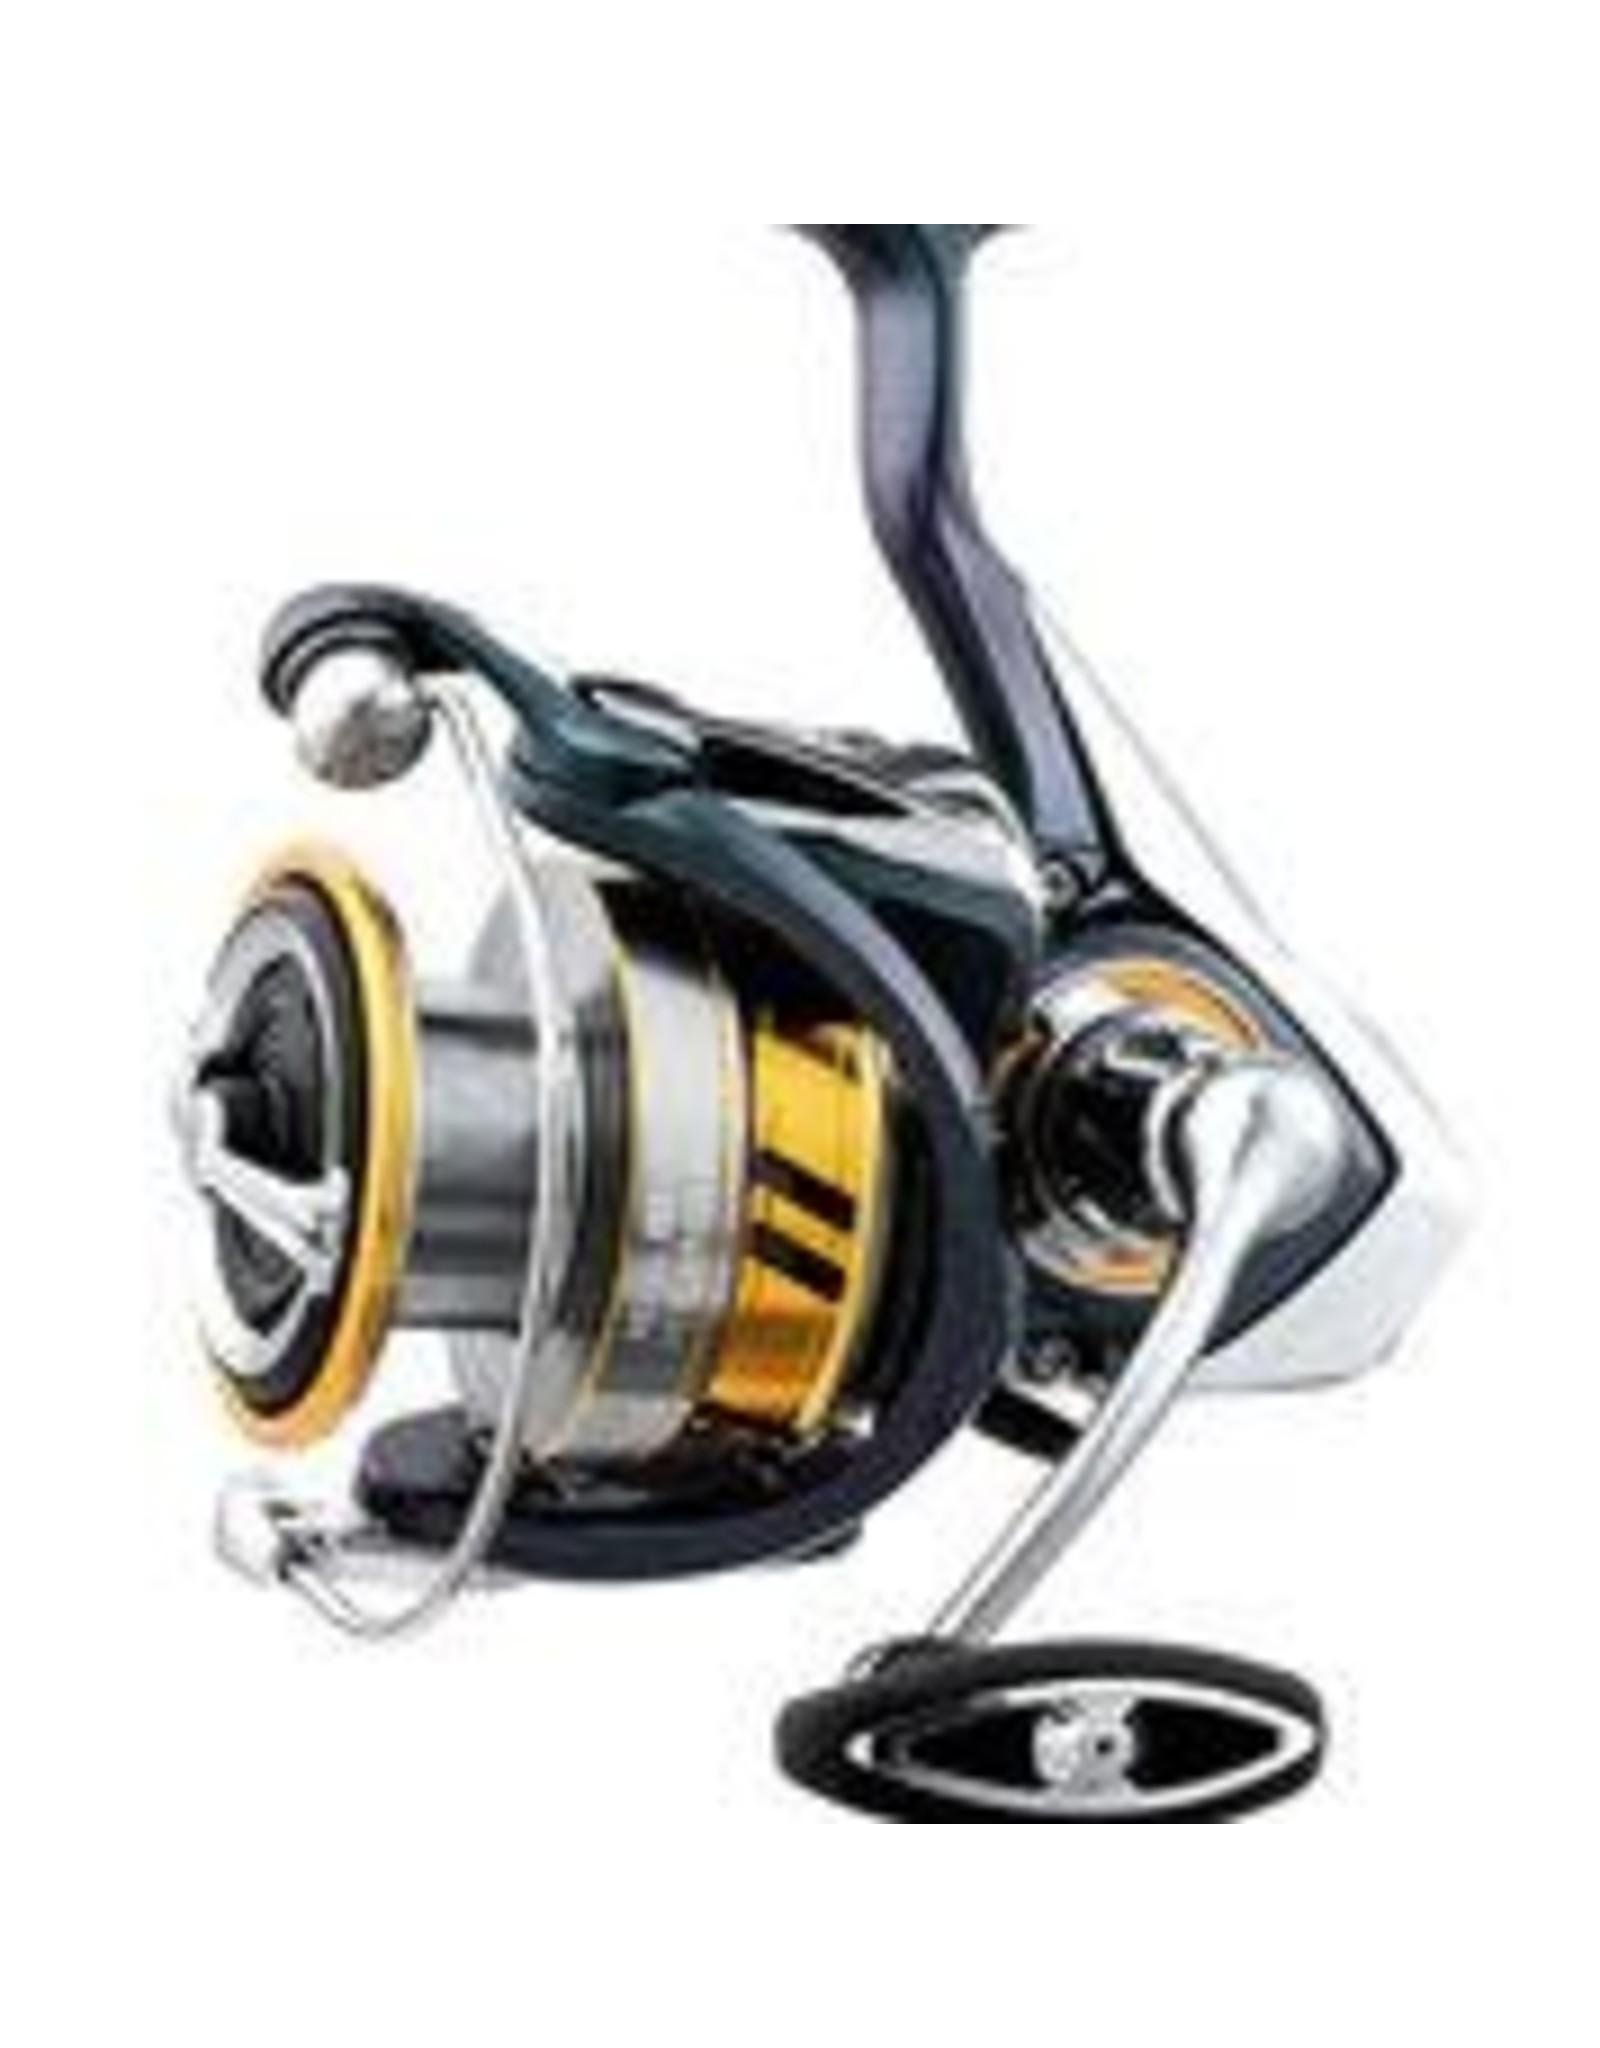 Daiwa Daiwa Regal LT Spinning Reel